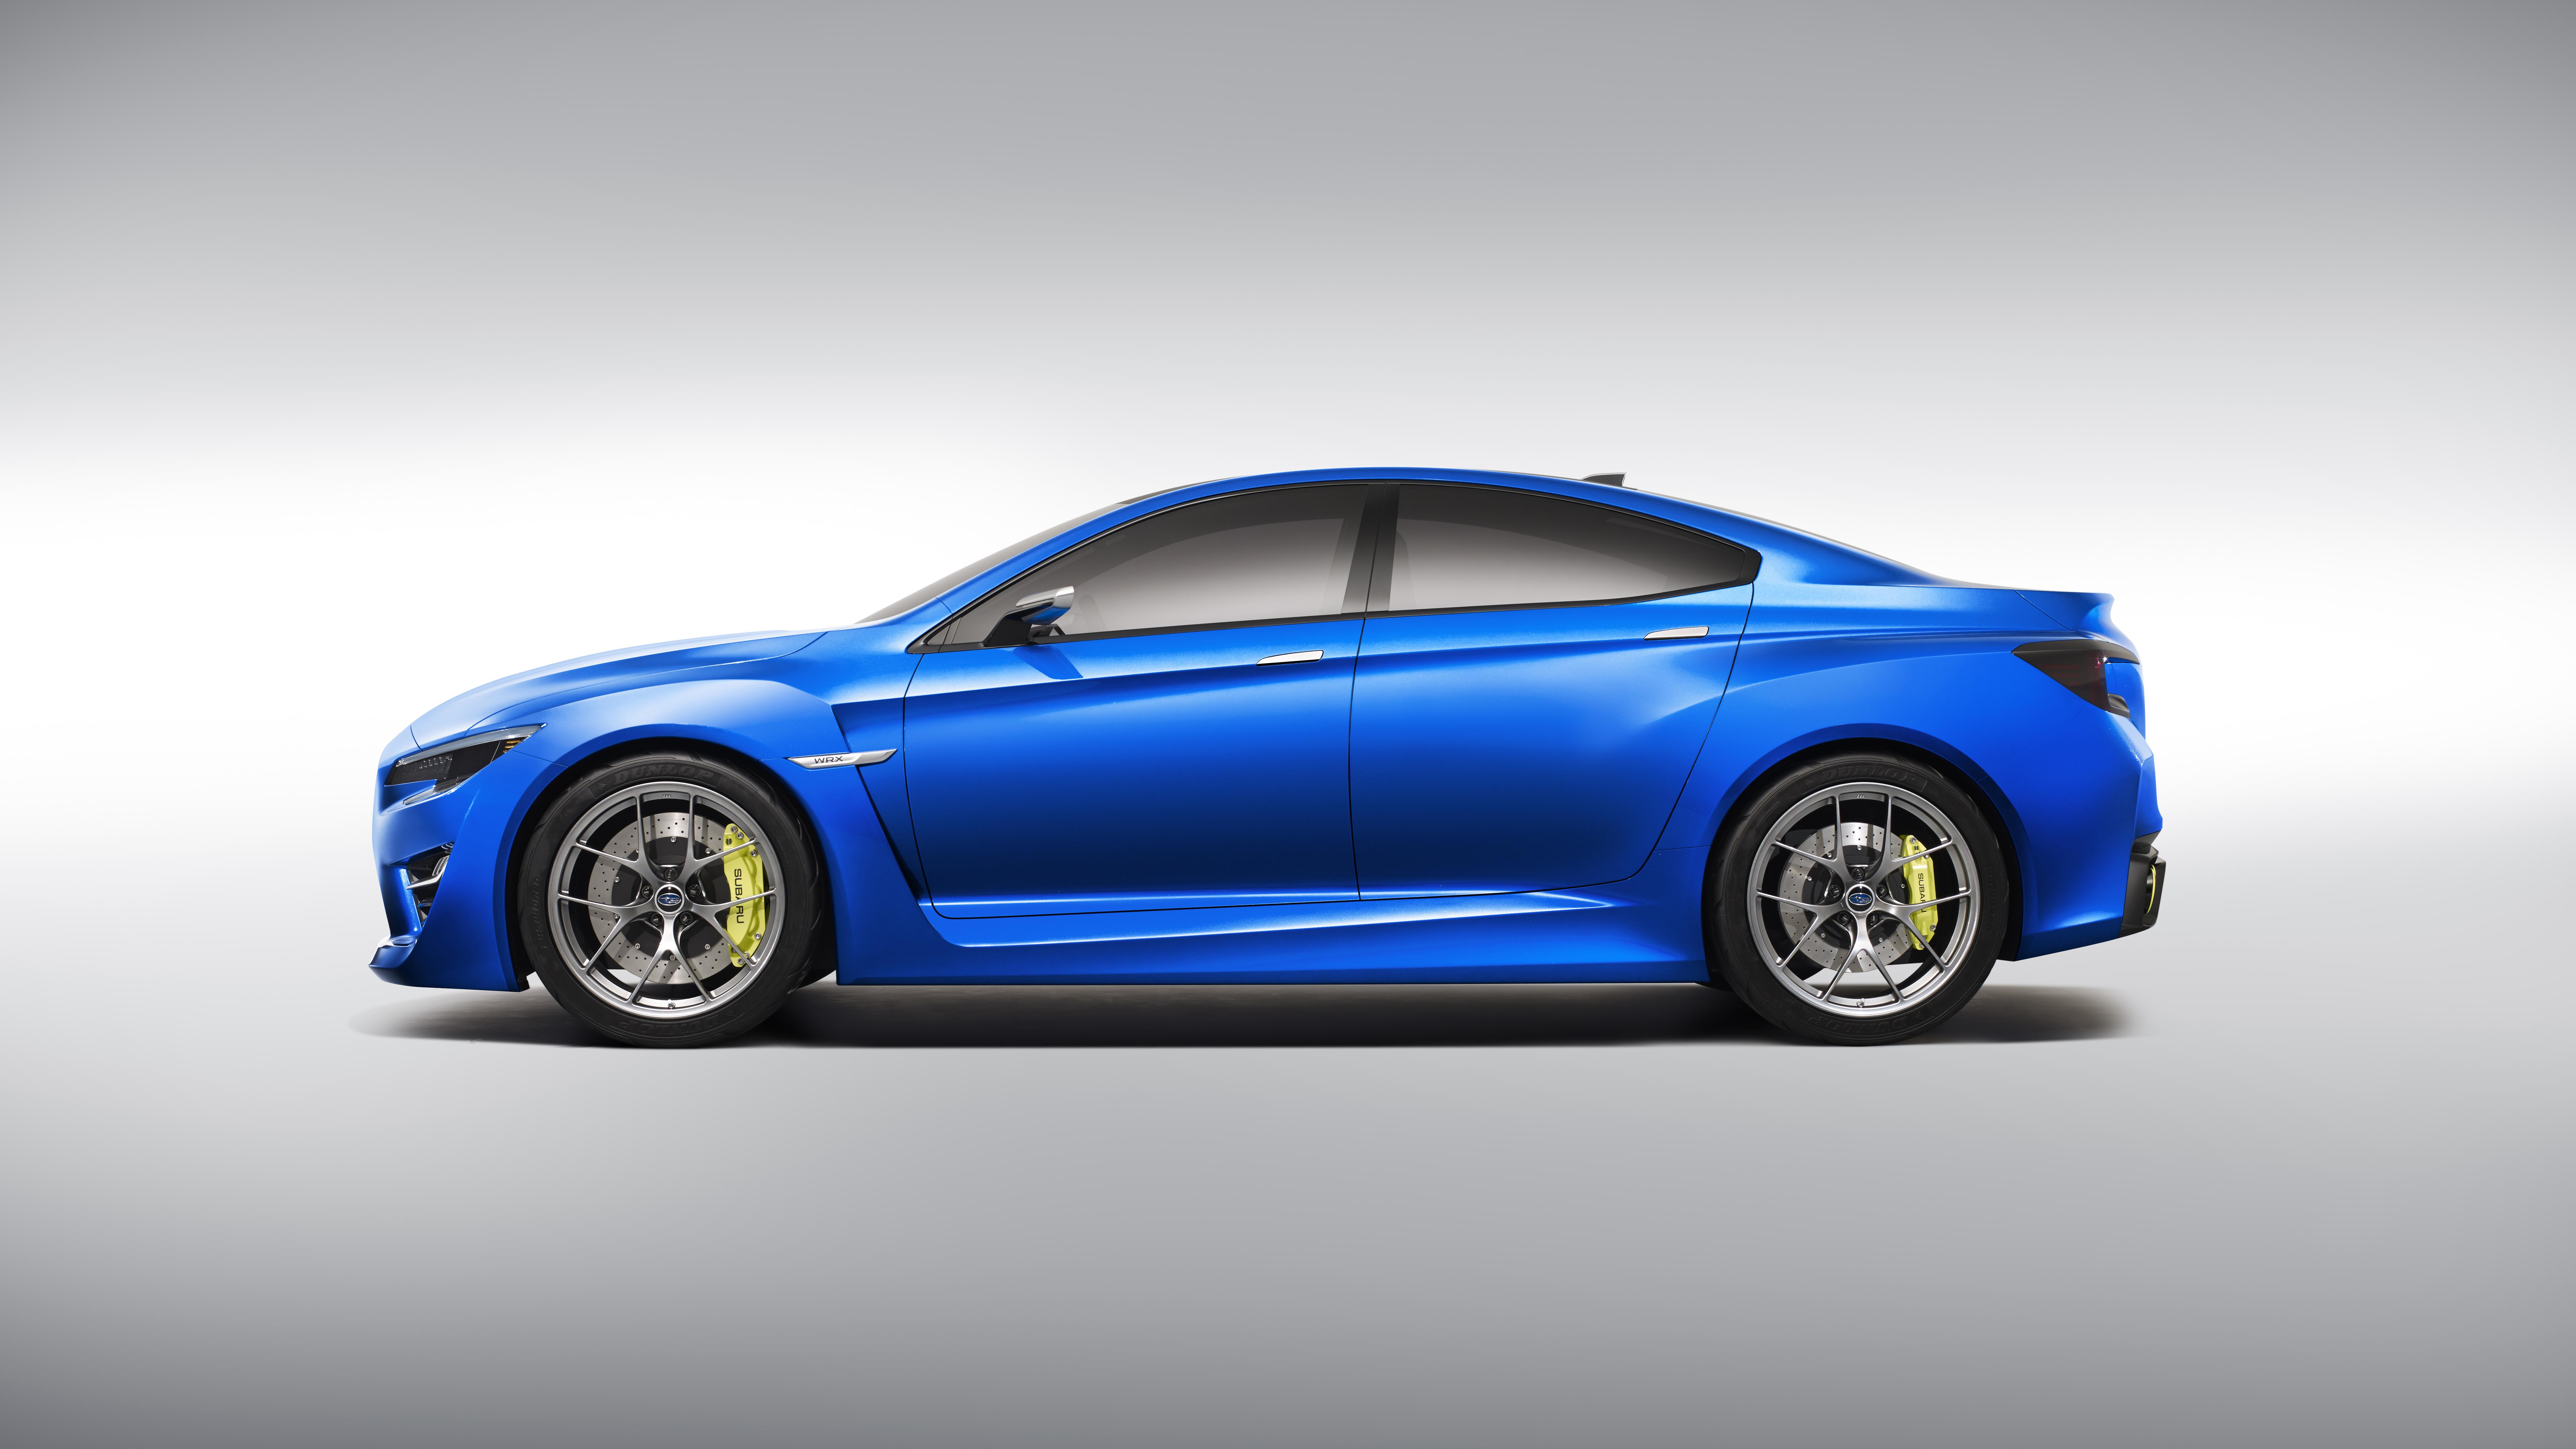 Subaru-WRX-Concept-Side-8K-Ultra-HD-Wallpaper